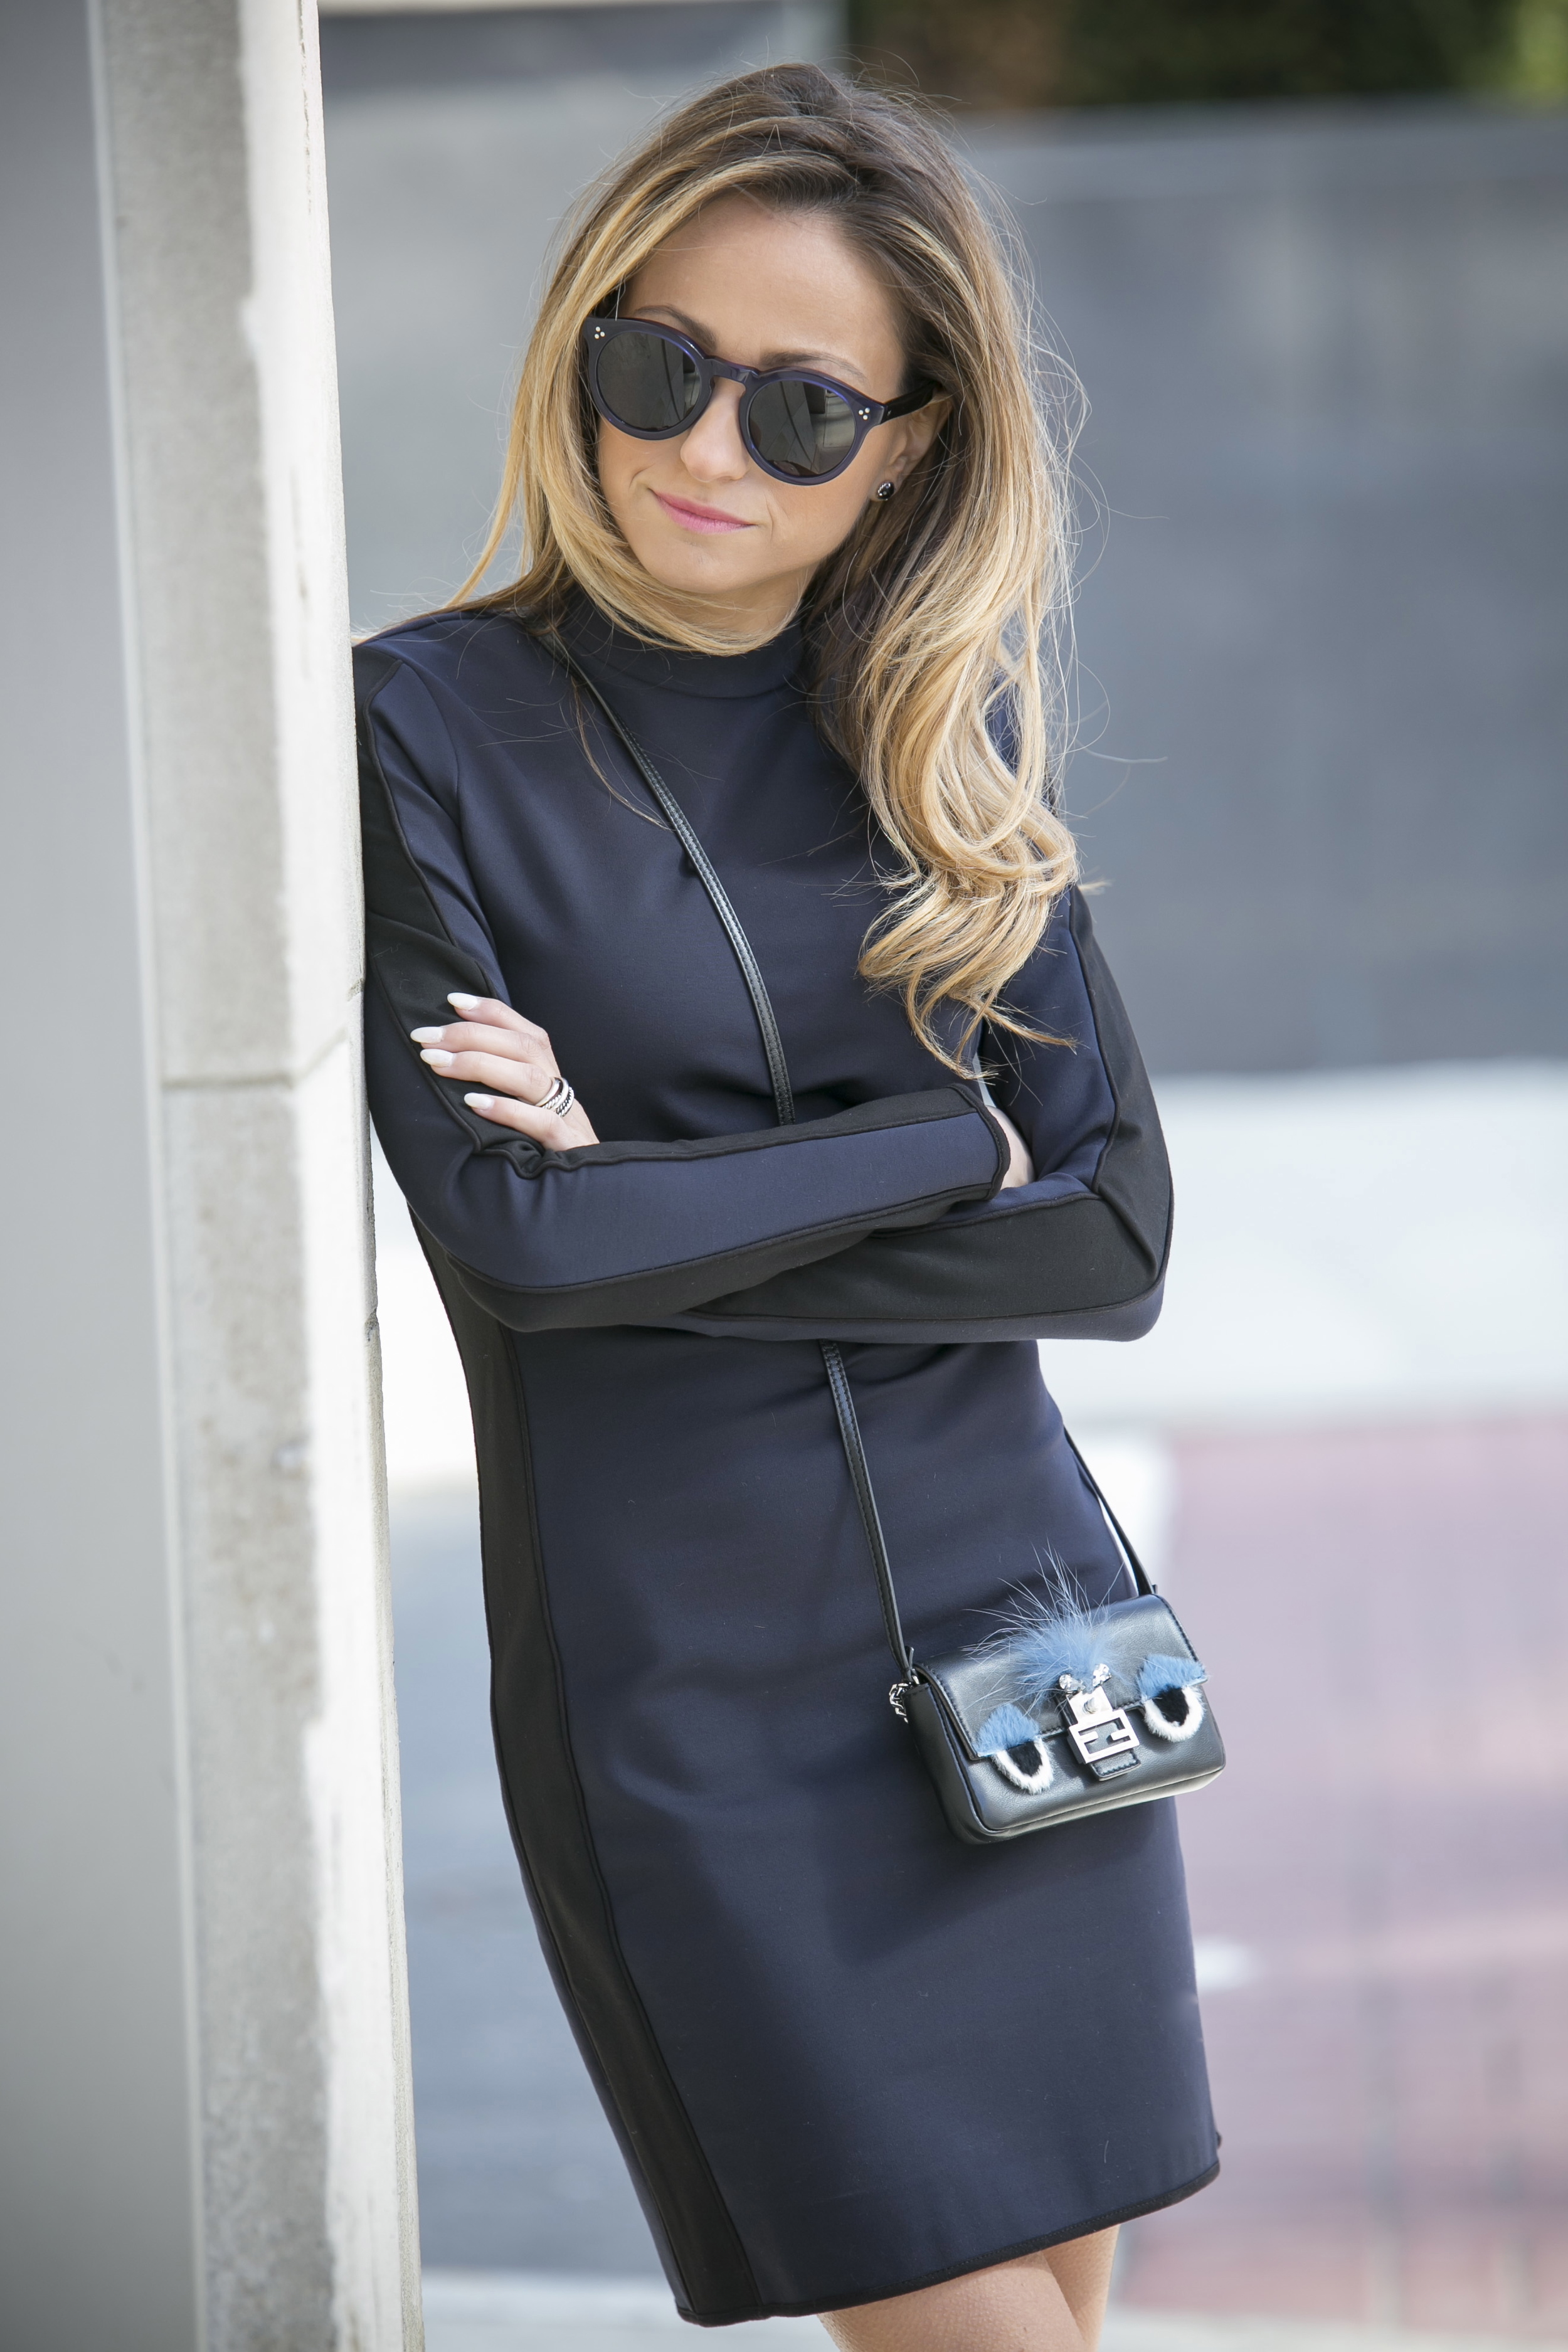 Illesteva sunglasses, rag and bone dress, fend bag for a streetstyle look on north of manhattan blogger